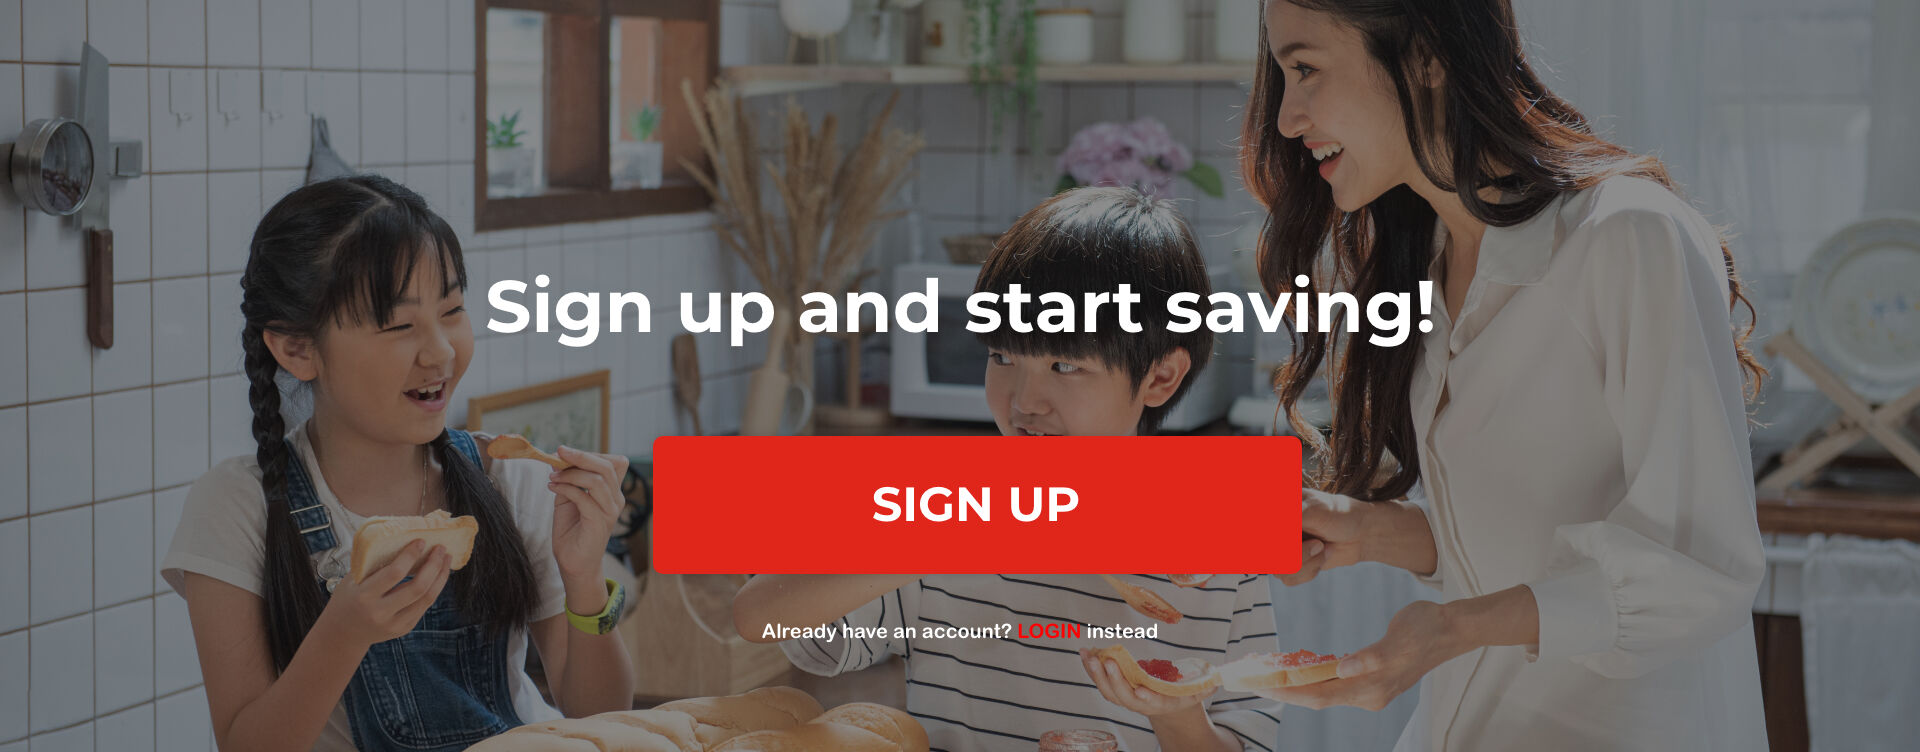 Sign up and start saving!